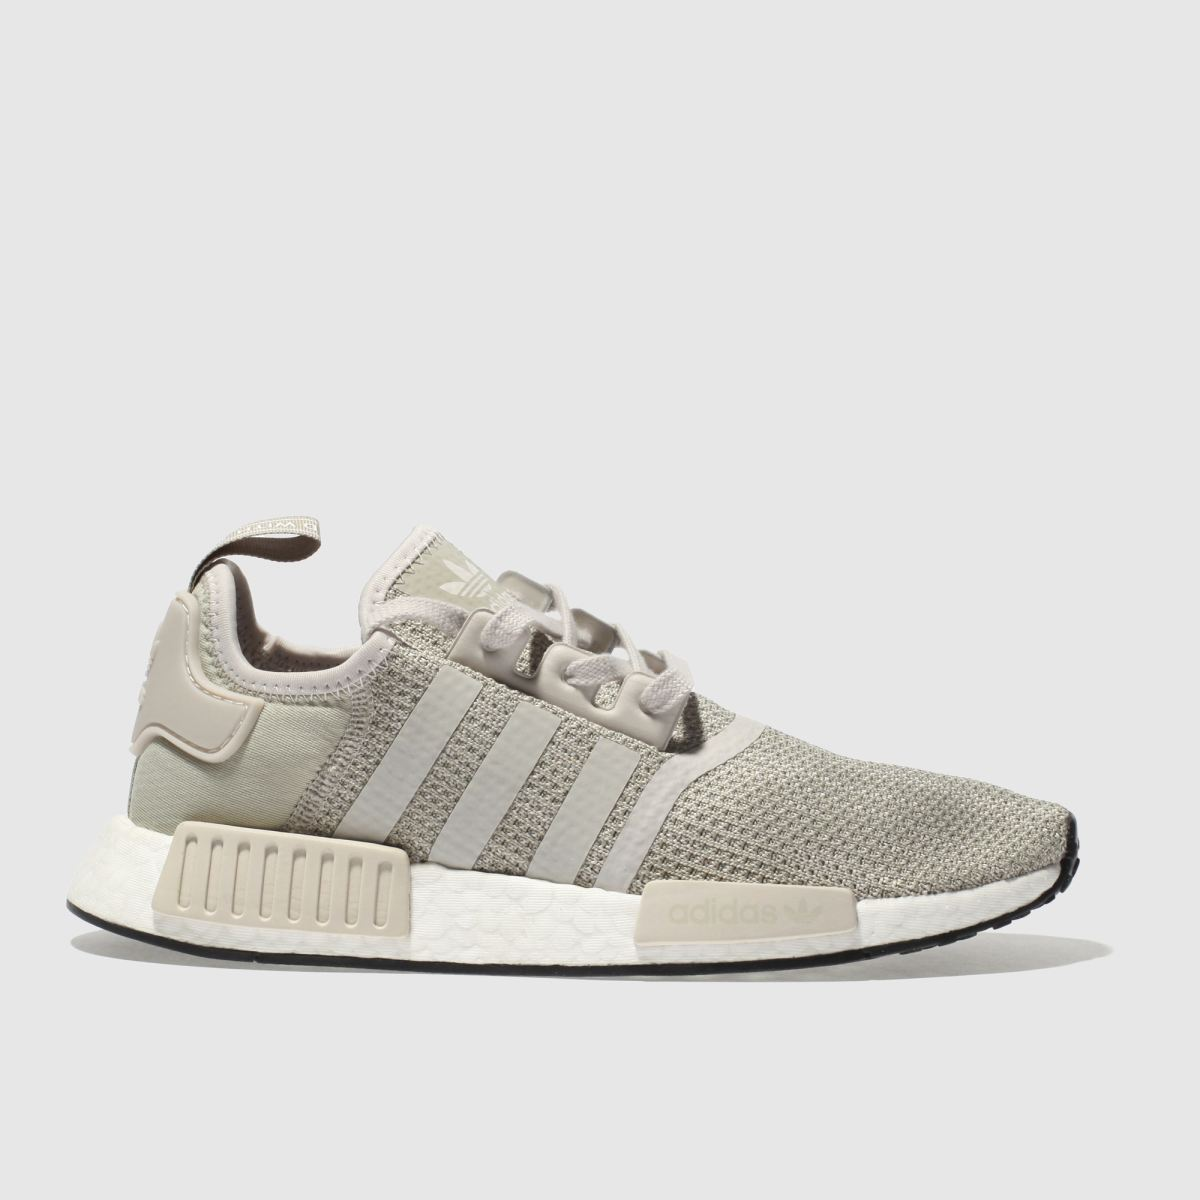 Adidas Grey Nmd_r1 Trainers